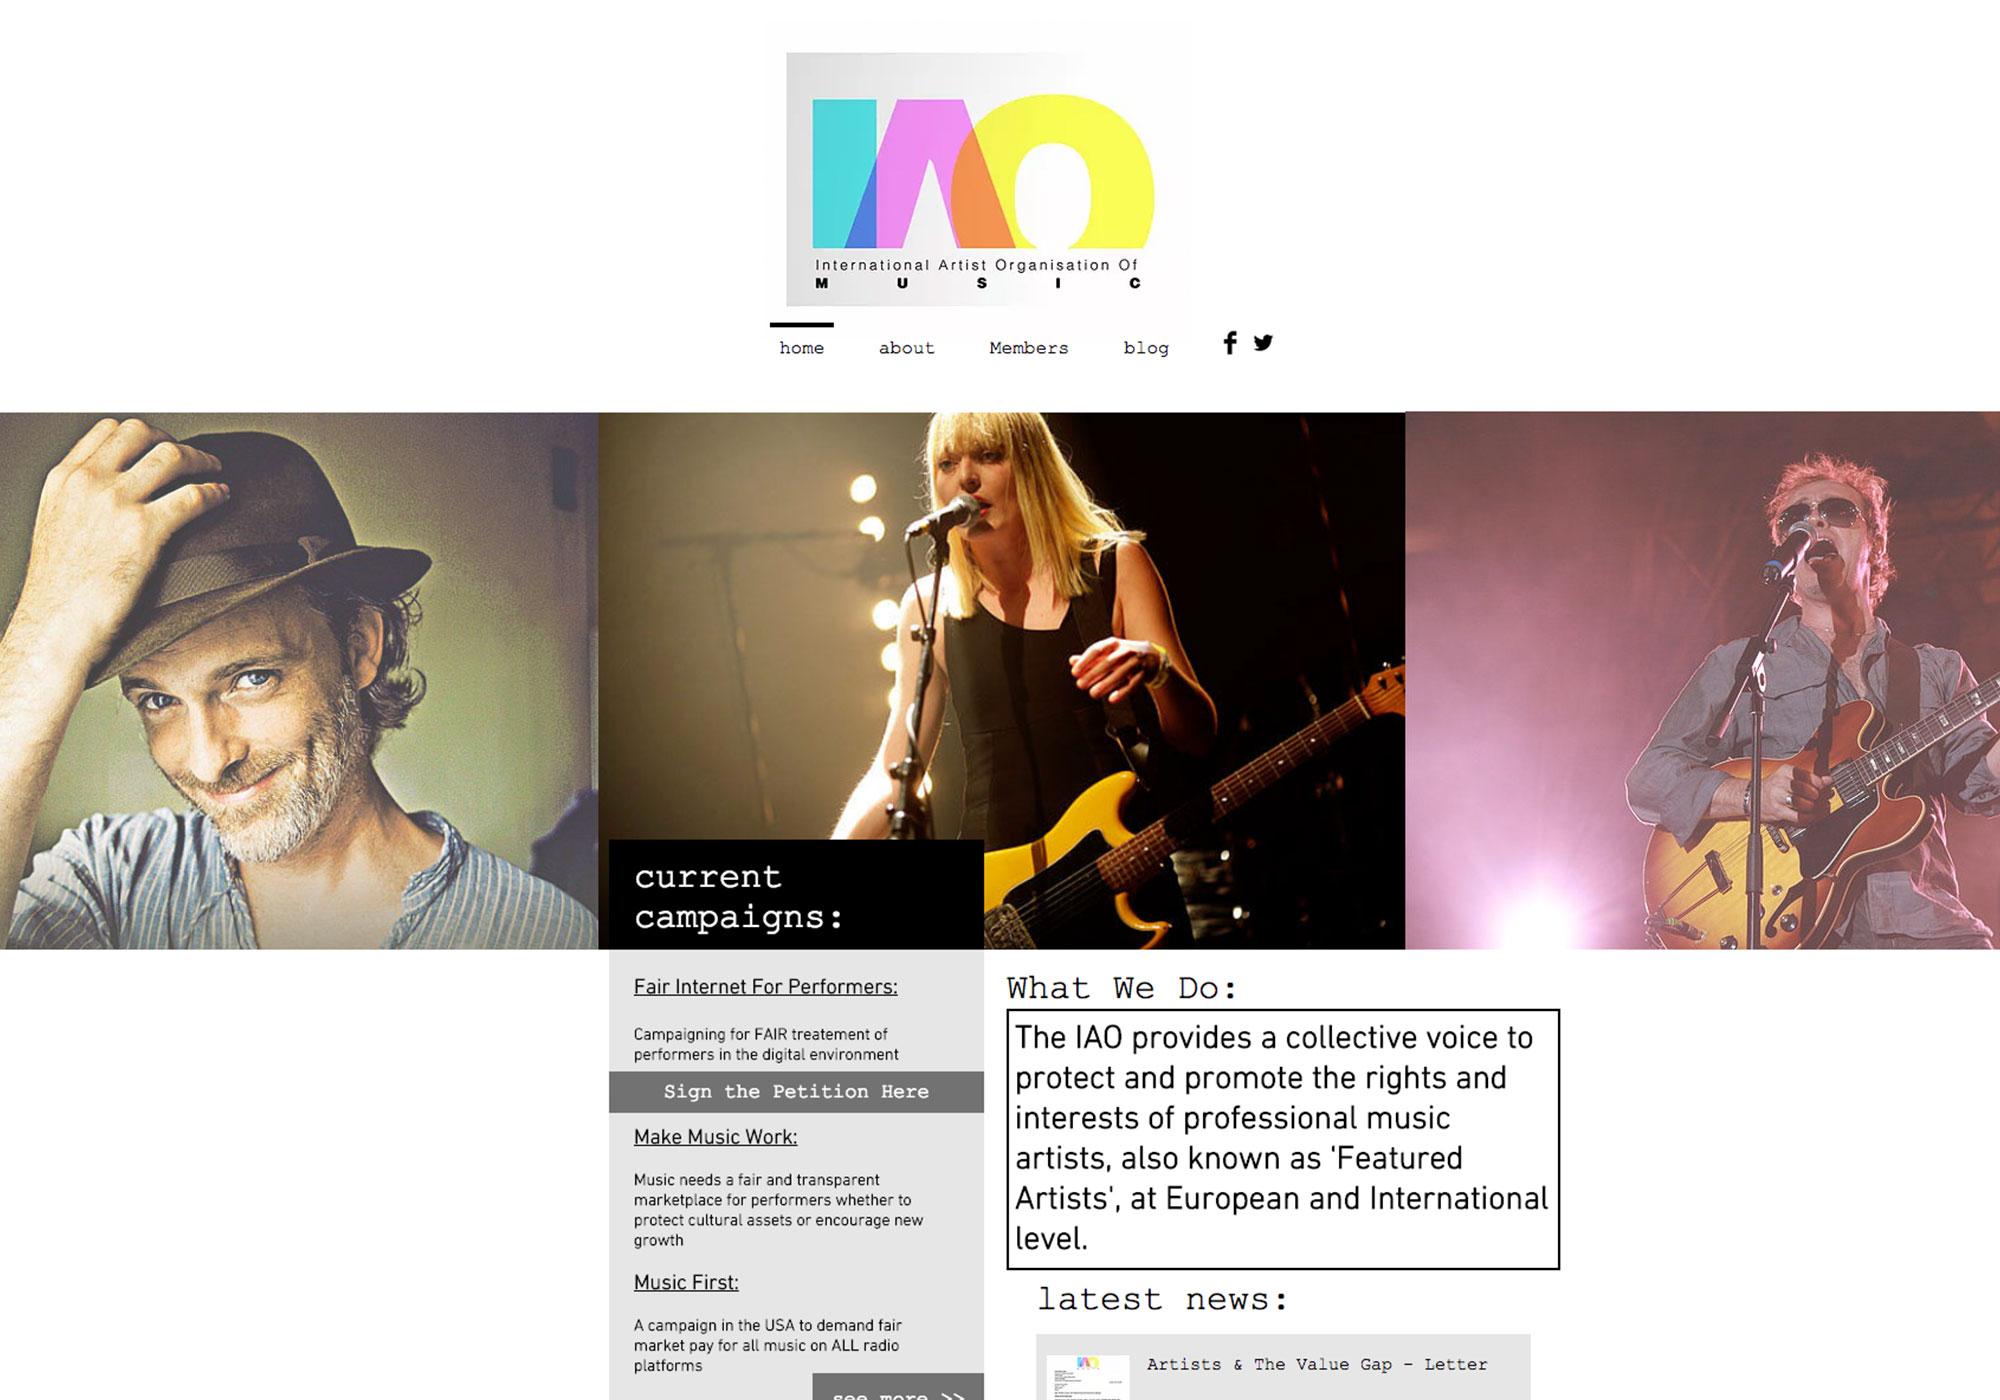 Fairness Rocks News International Artists' Organisation